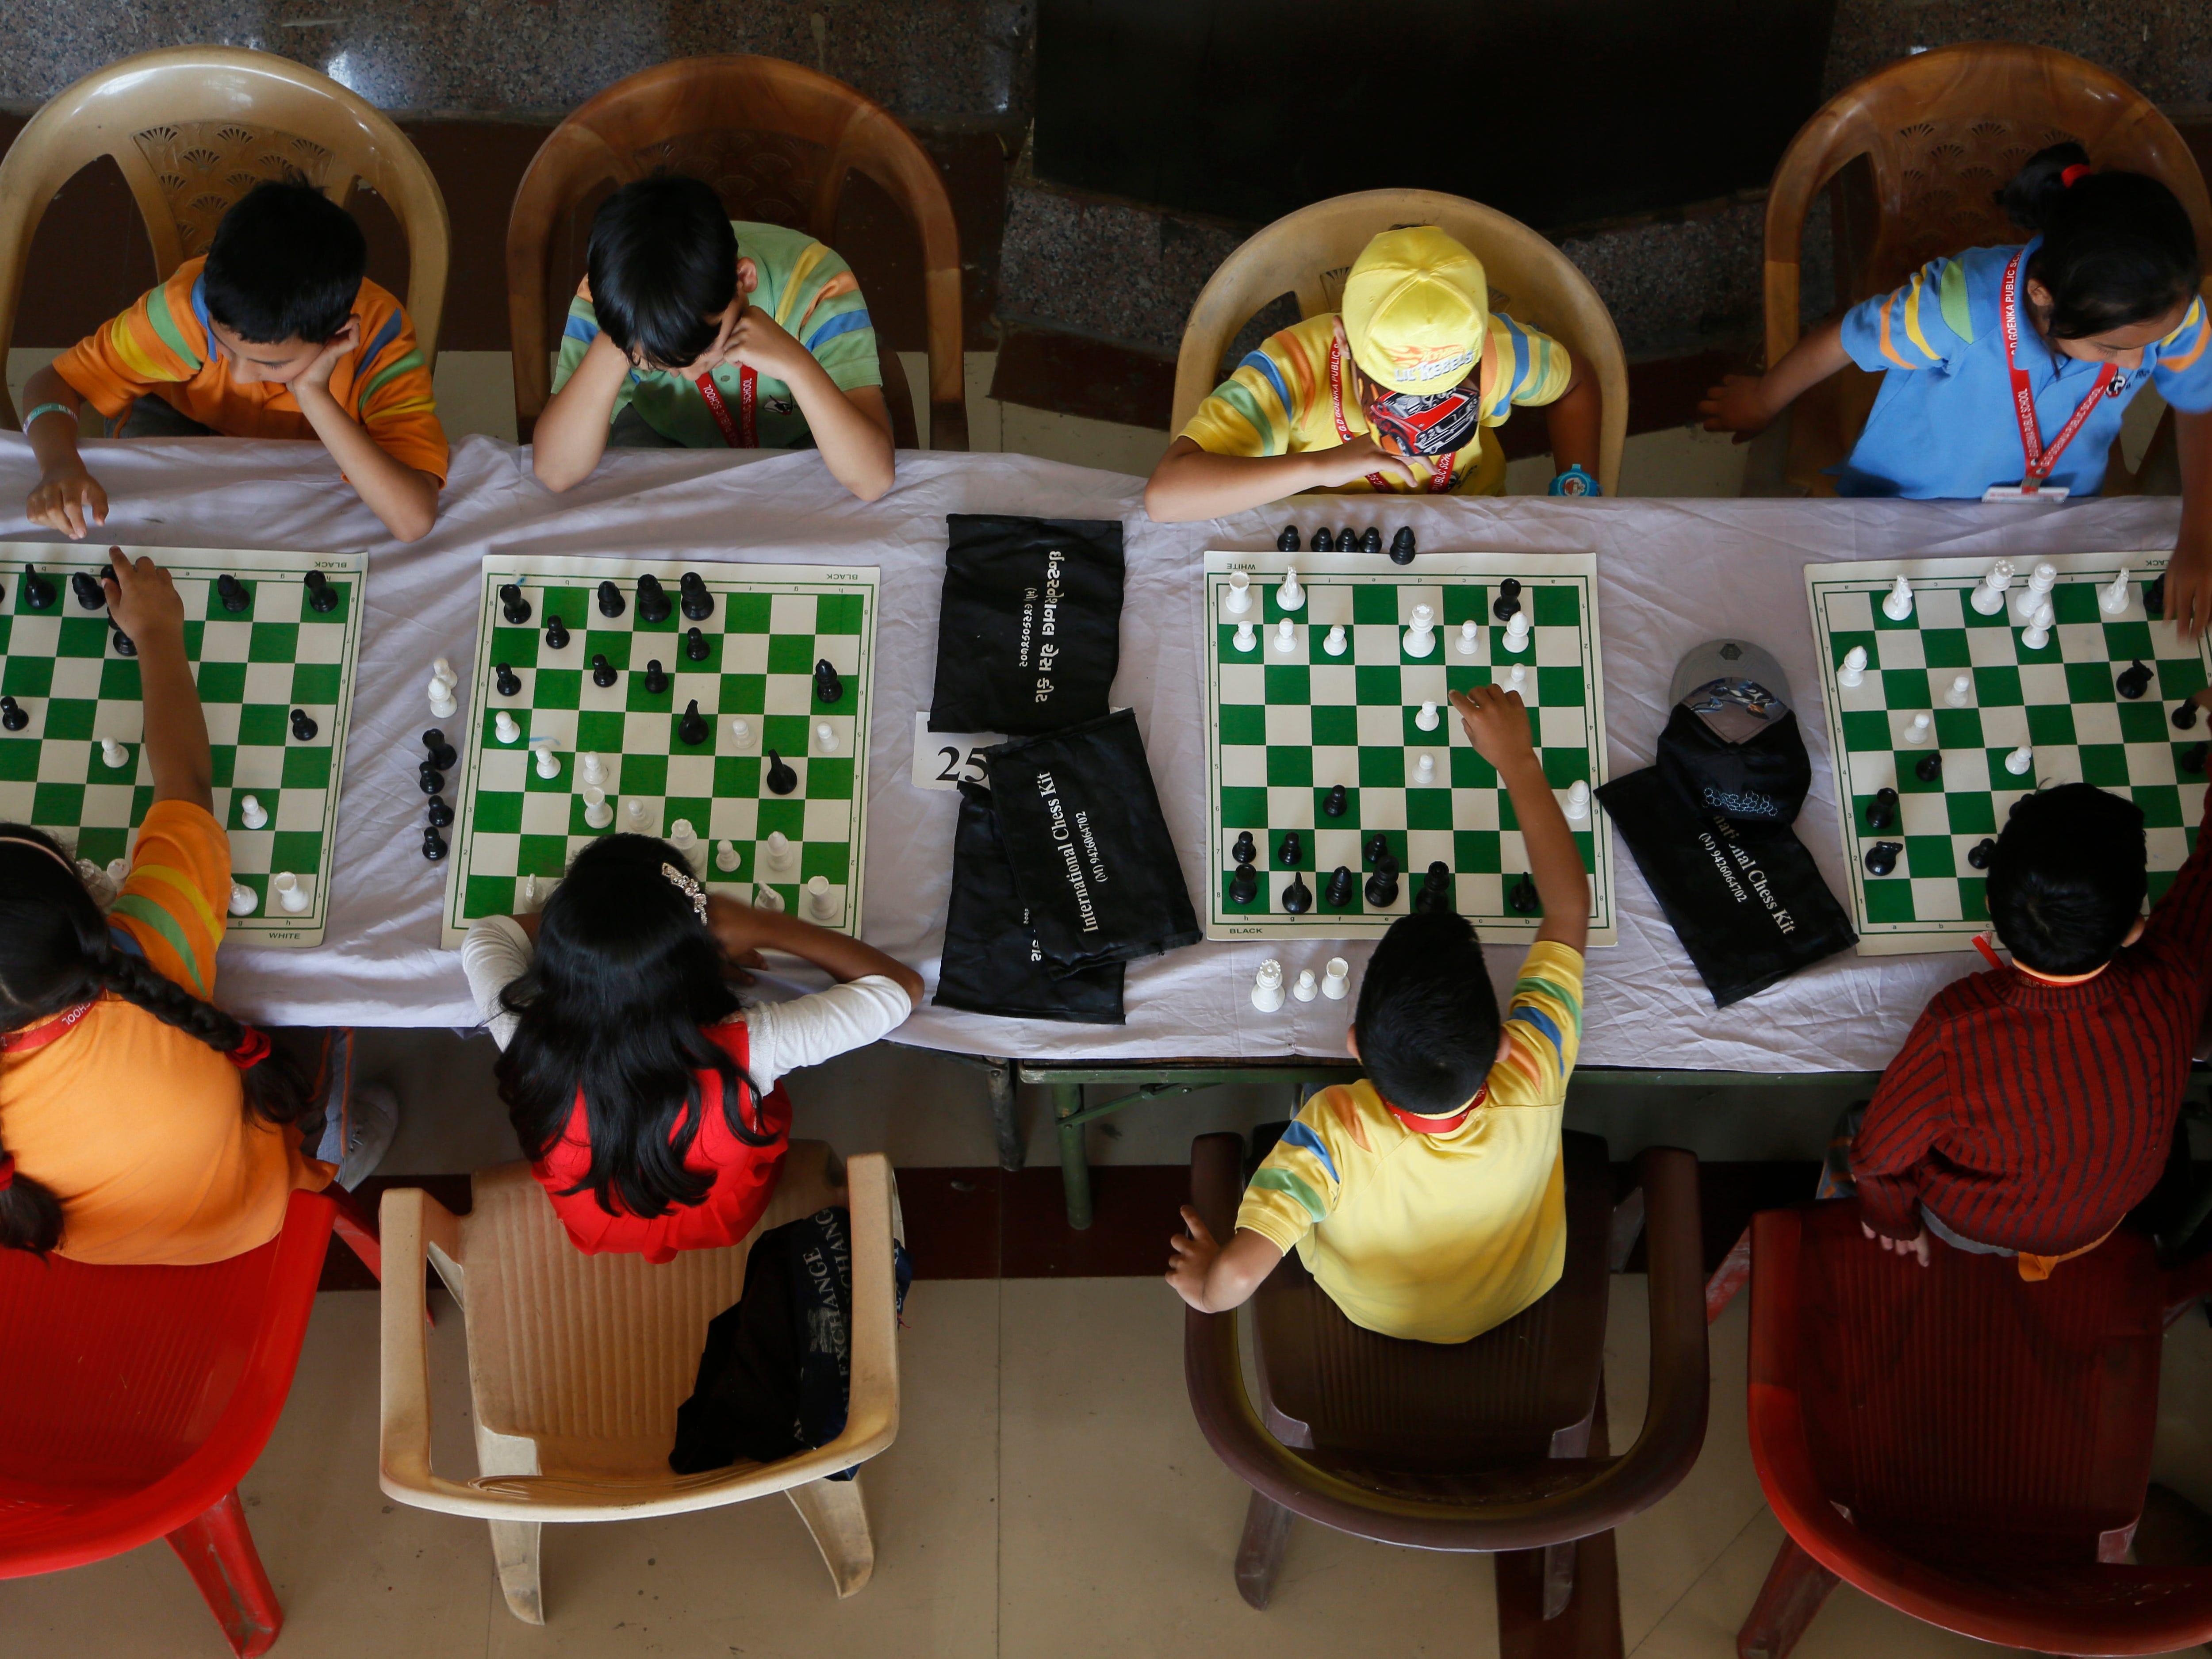 Kashmiri school children take part in a Chess championship in Srinagar, Indian controlled Kashmir, Sunday, Oct. 7, 2018.